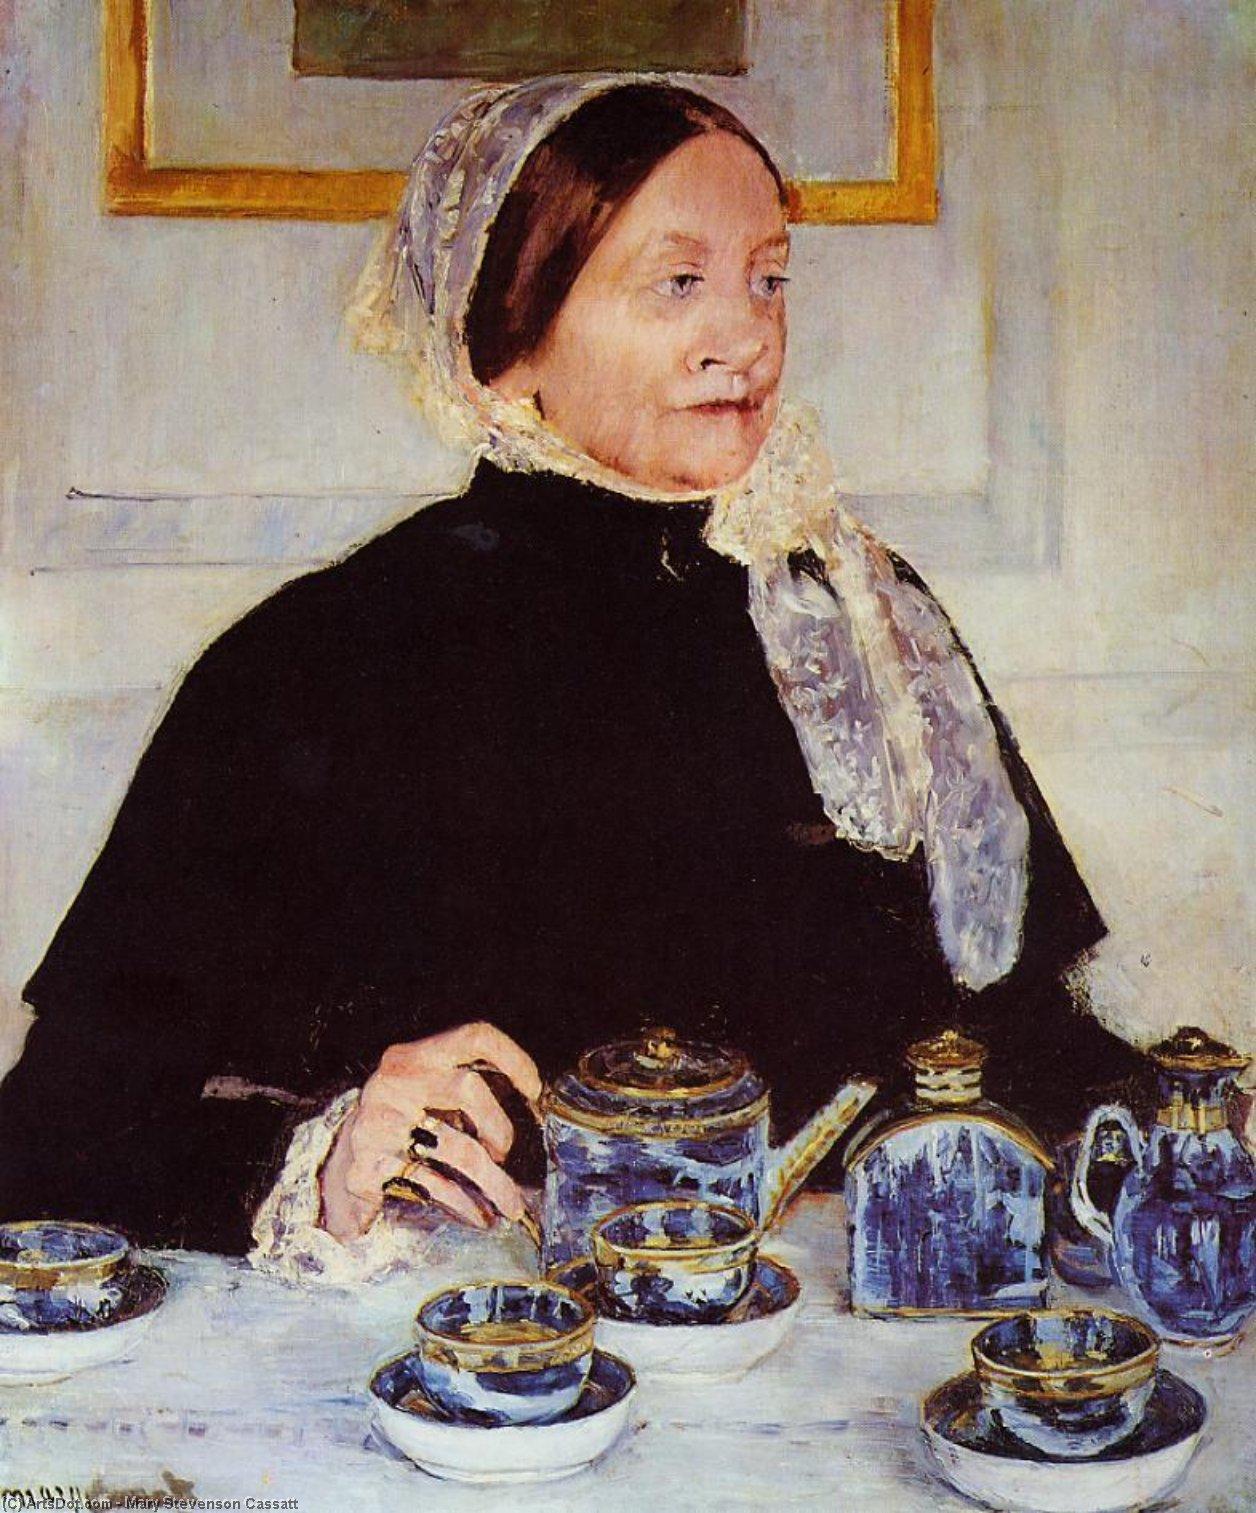 Wikioo.org - The Encyclopedia of Fine Arts - Painting, Artwork by Mary Stevenson Cassatt - Lady at the Tea Table